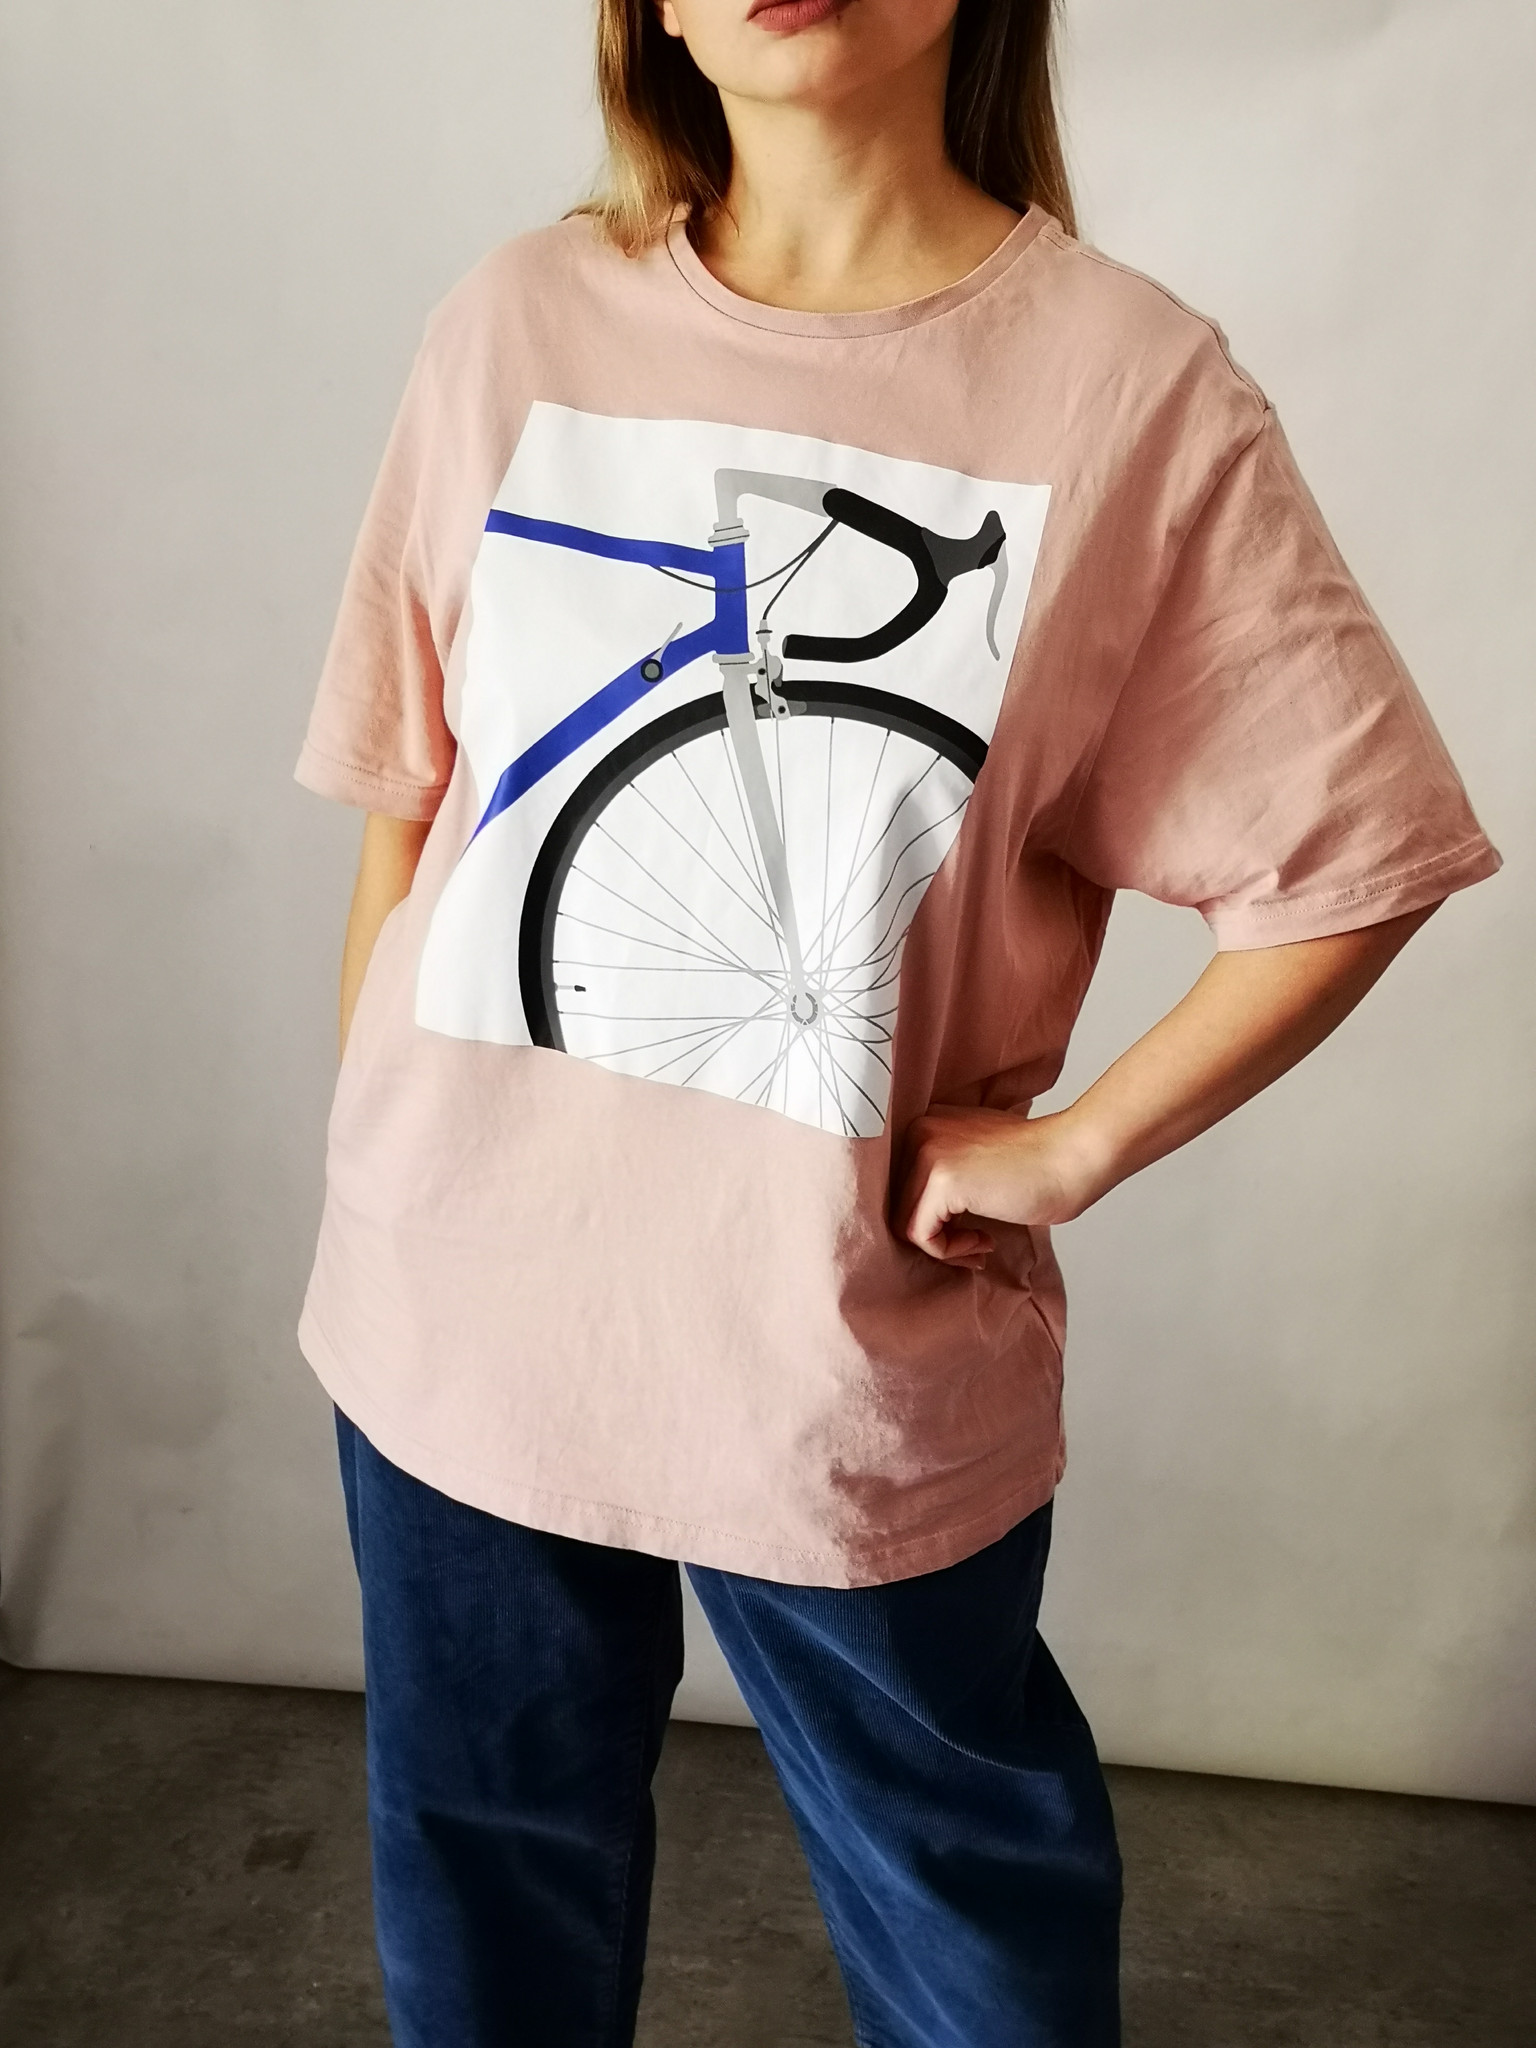 t-shirt oversize rower - Nie byle | JestemSlow.pl